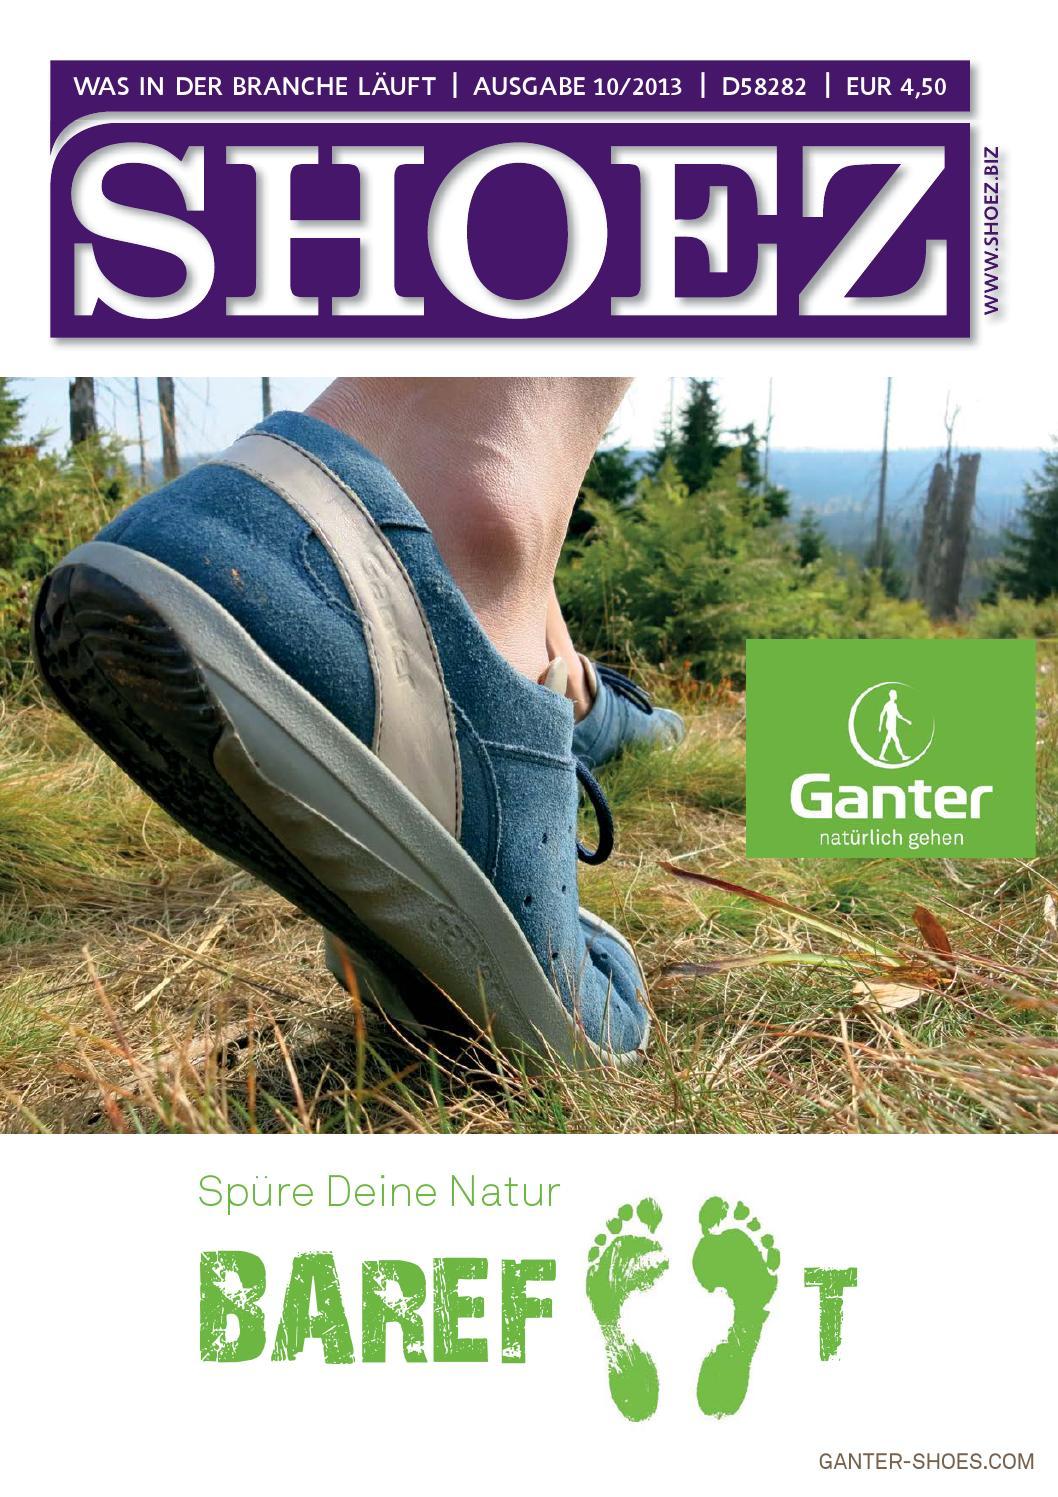 100 Paar BIRKENSTOCK TATAMI Restposten Schuhe Sandalen 36 42 NEU